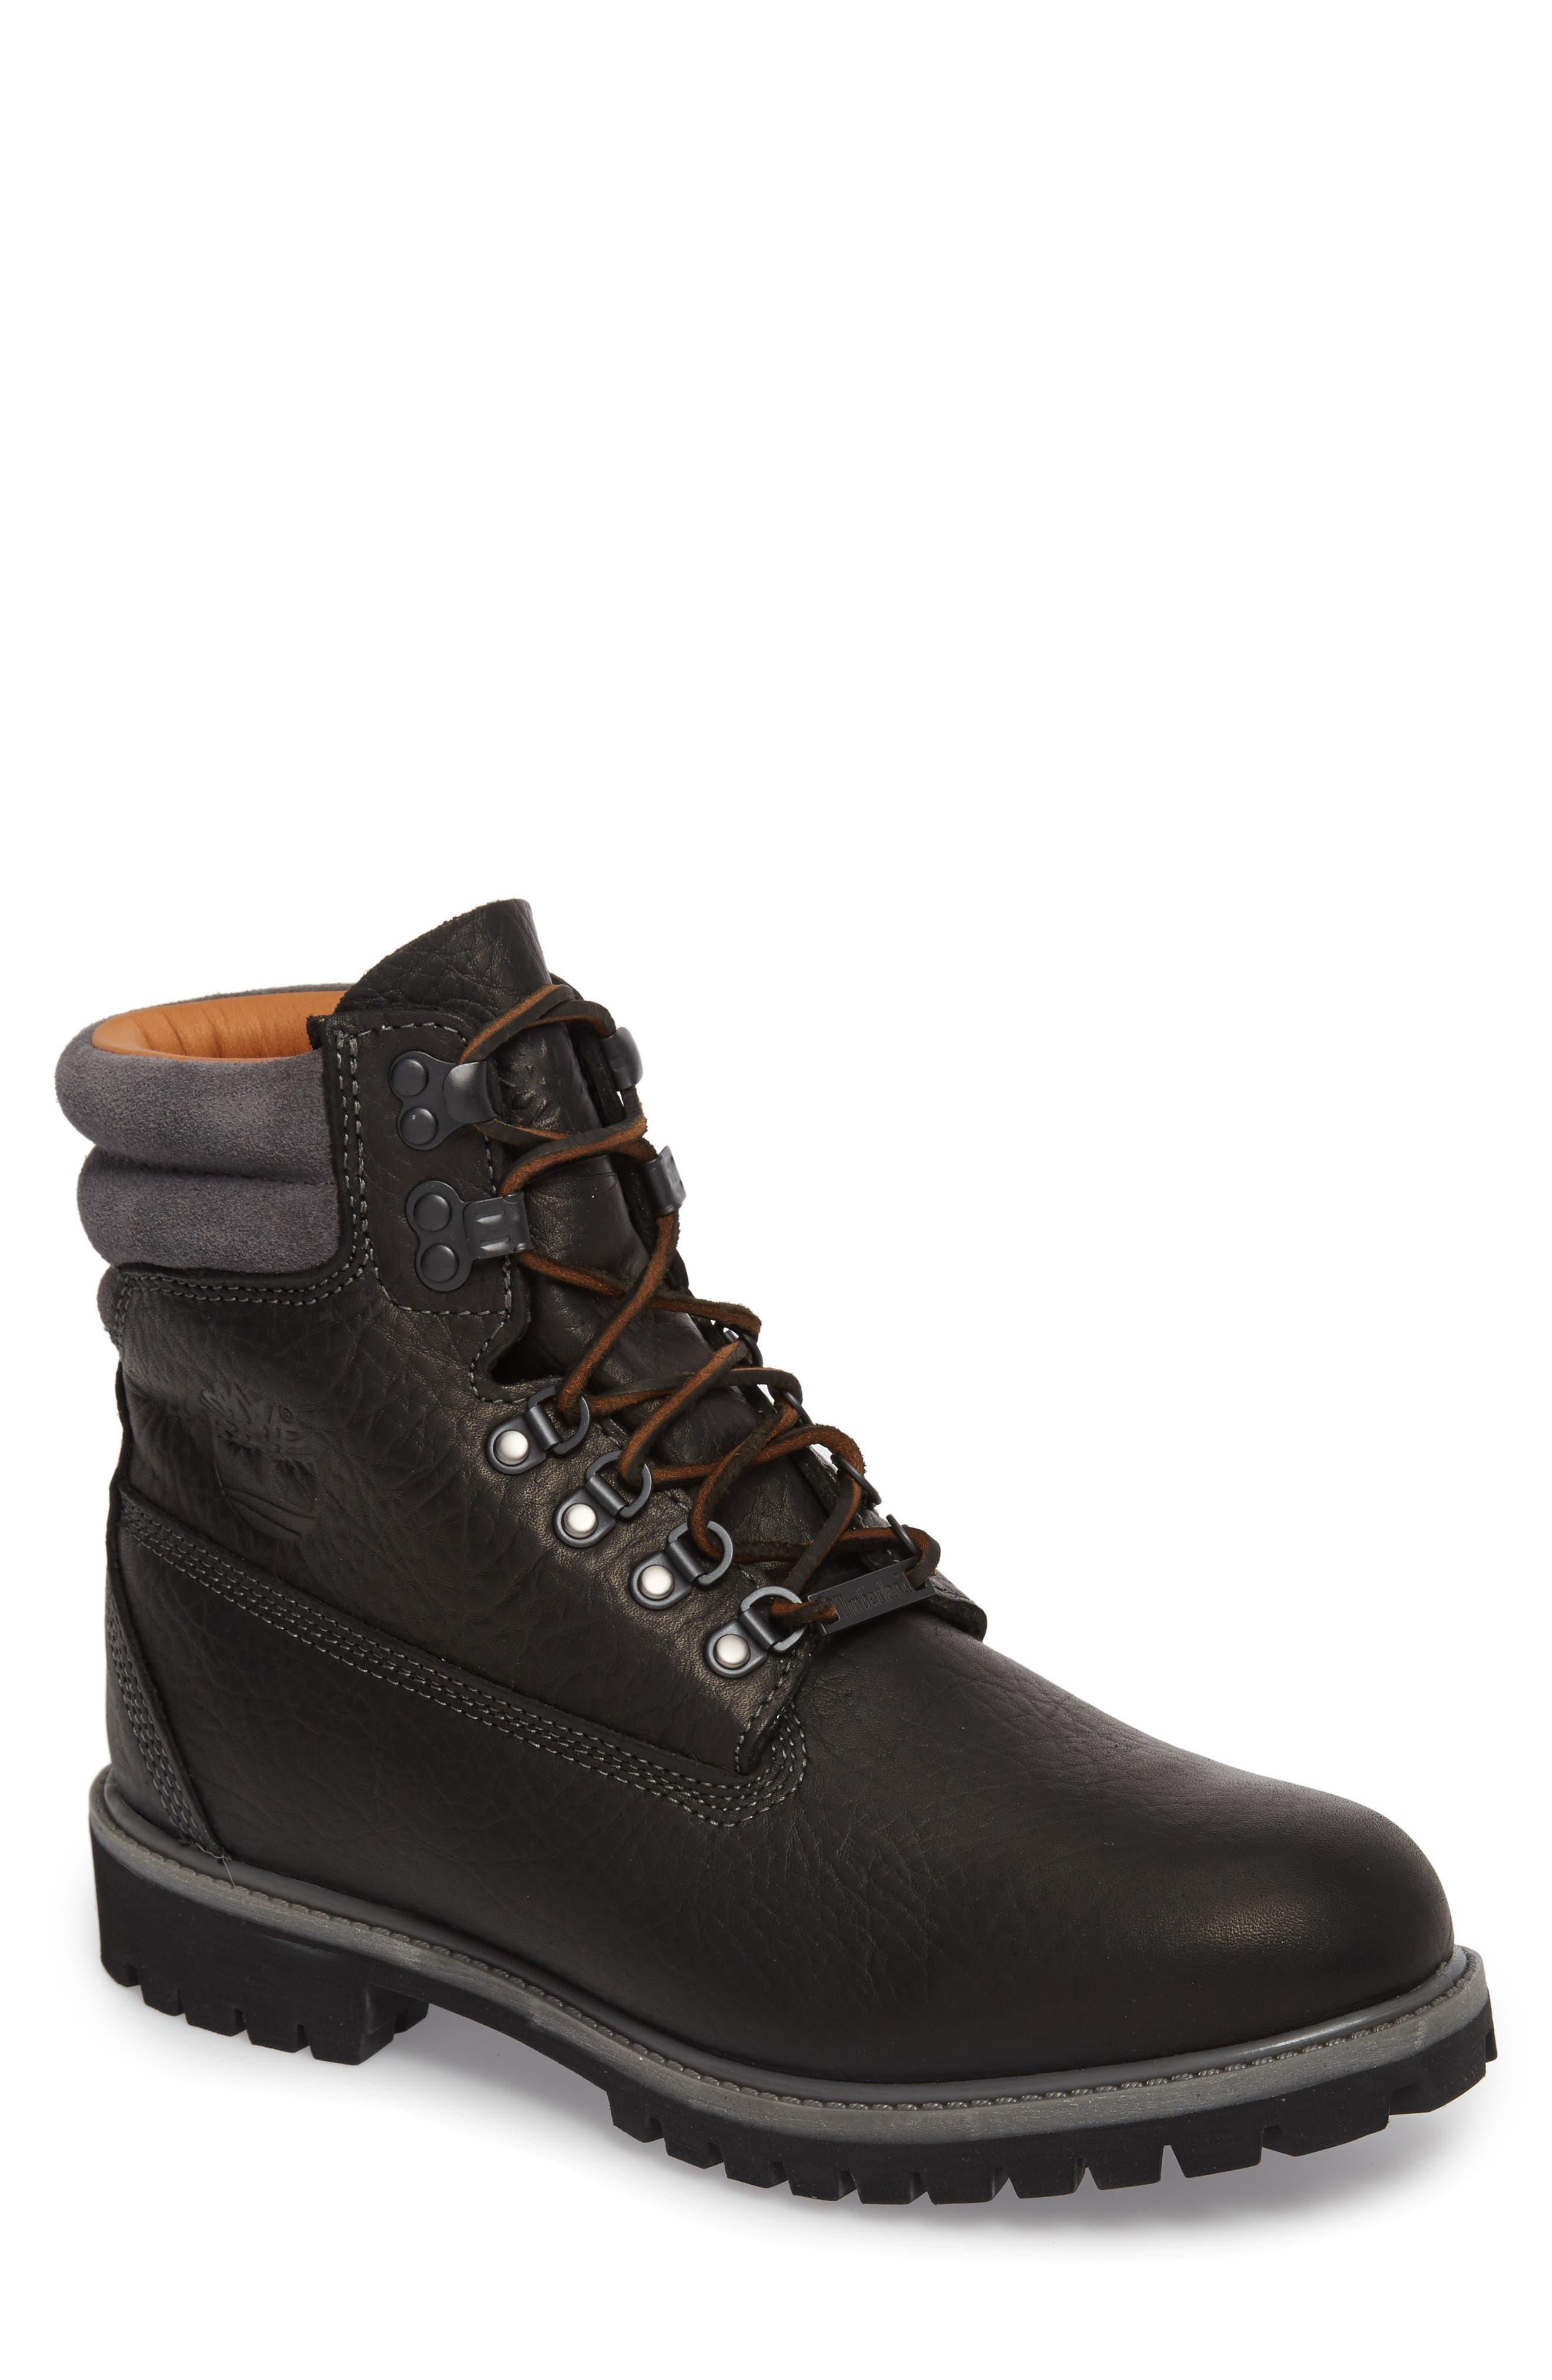 Timberland 640 Below Plain Toe Waterproof Boot- Black